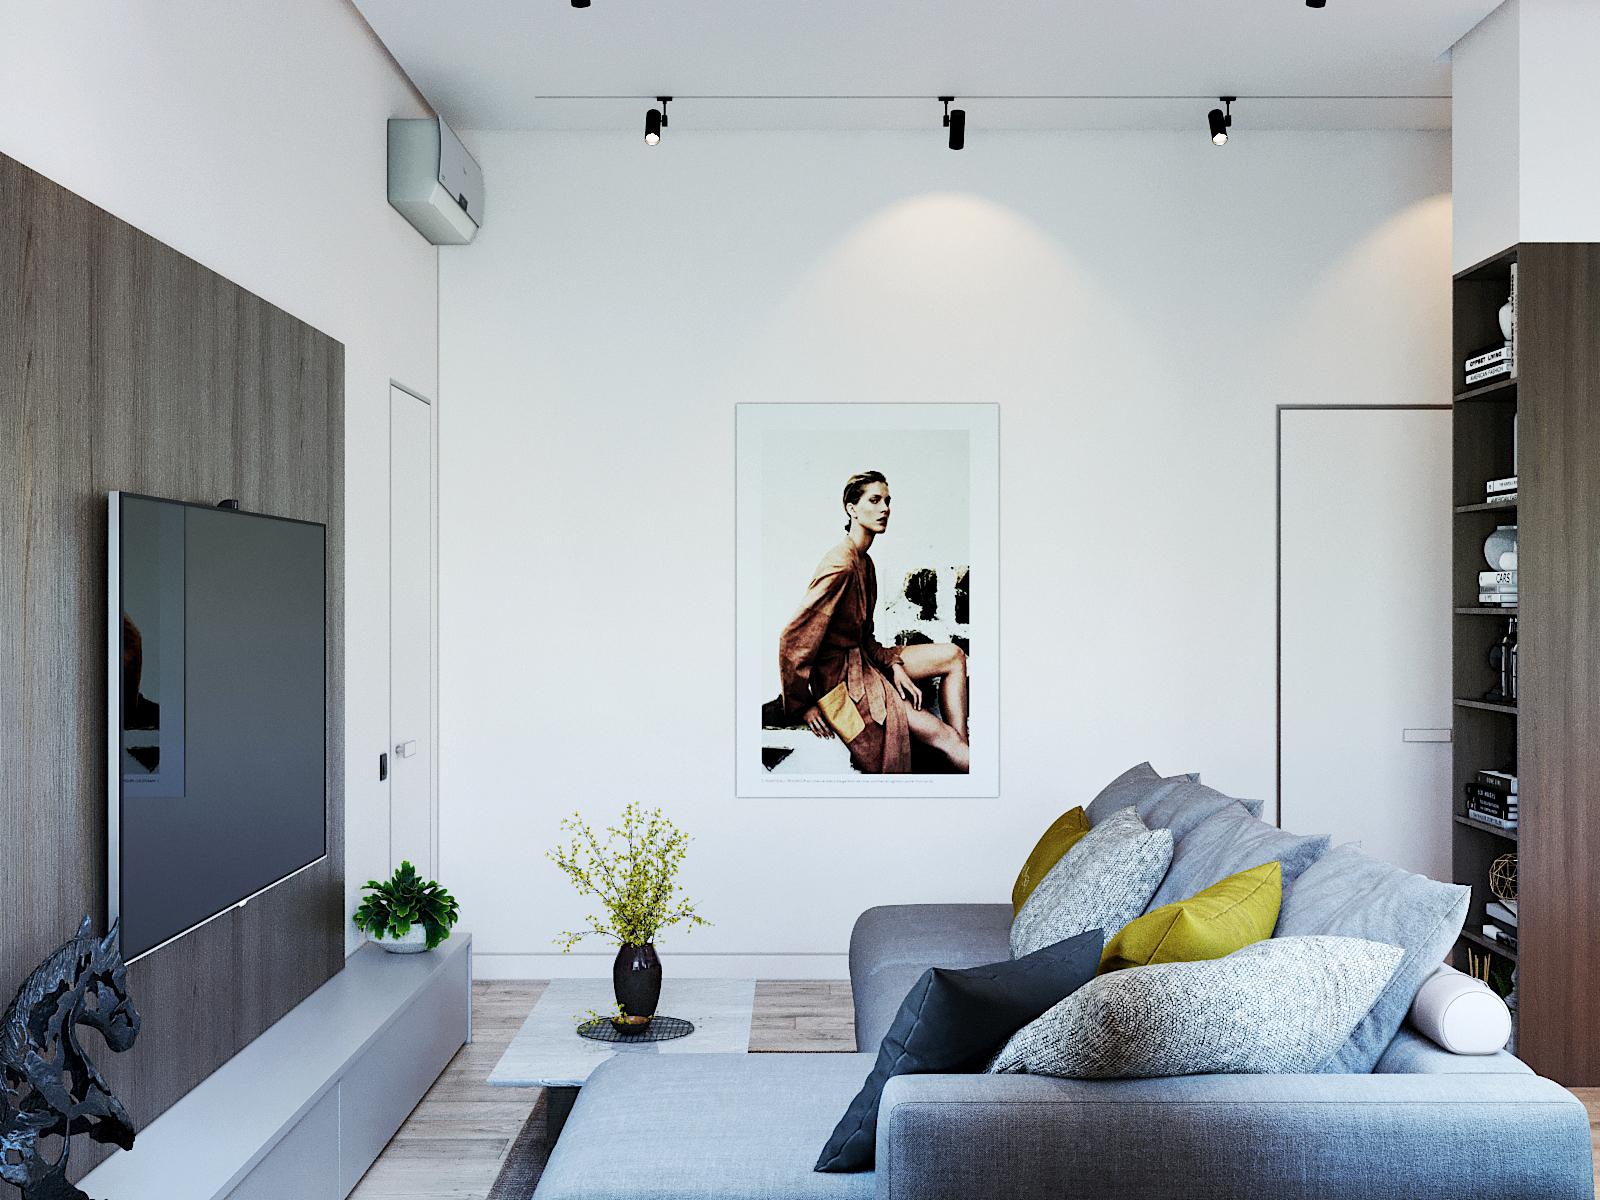 https://avantum-remont.ru/wp-content/uploads/2015/05/Livingroom-Kitchen_Interactive-LightMix_View06.jpg